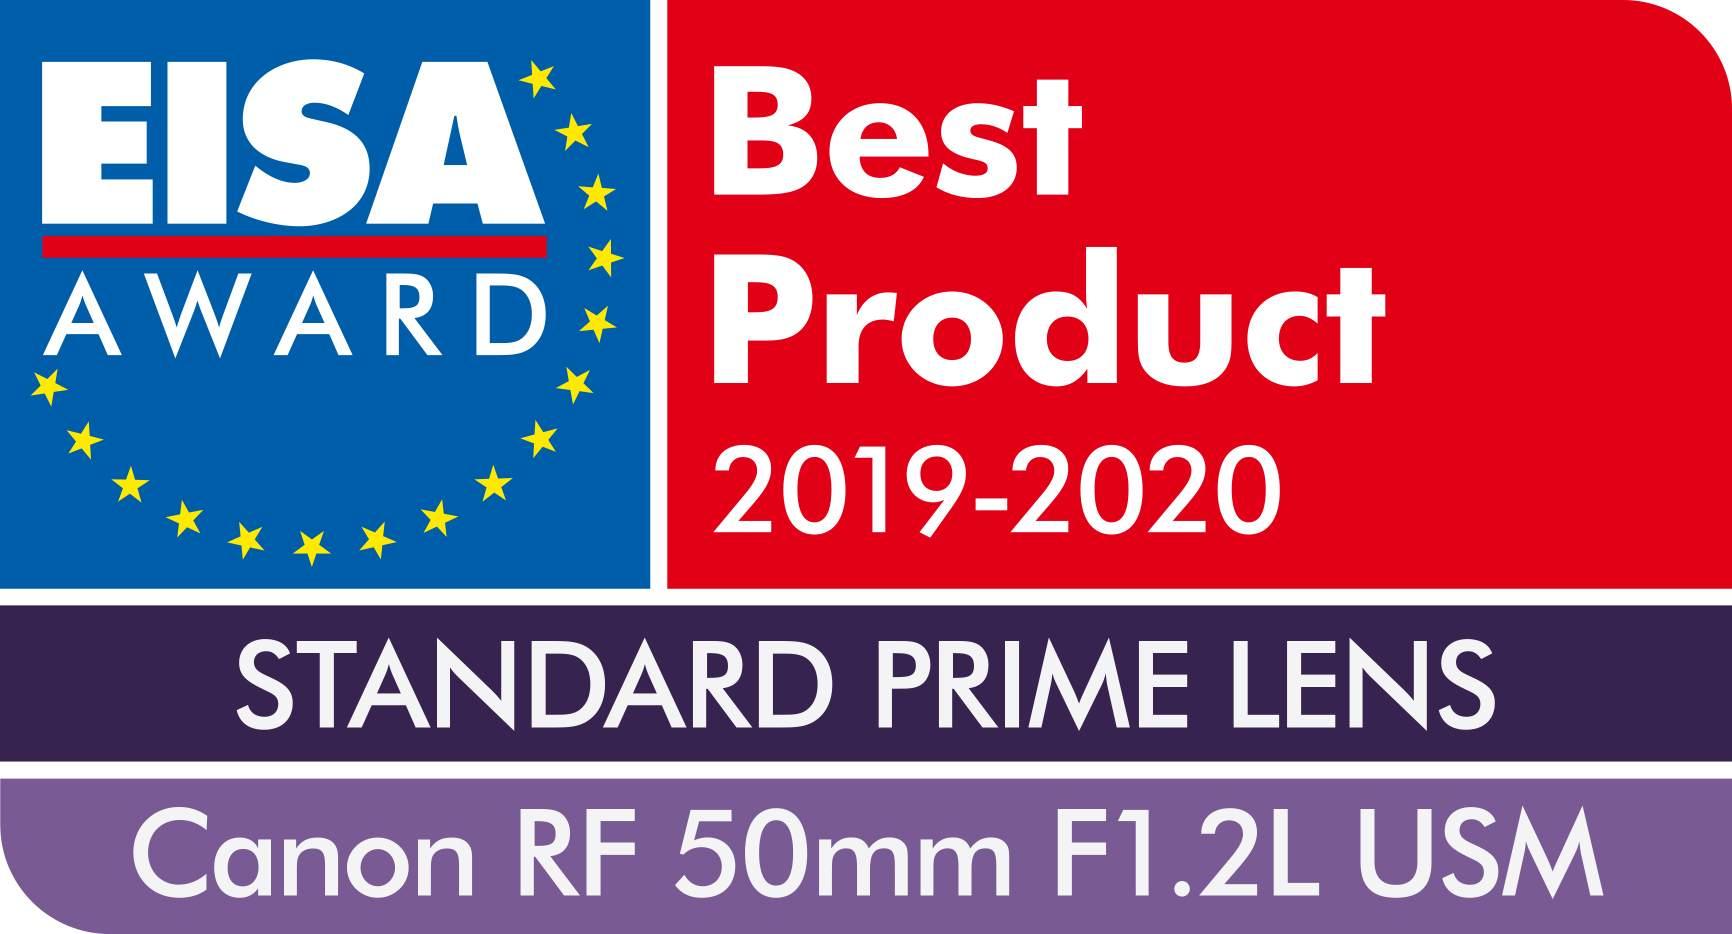 EISA Award Canon RF 50mm F1-2L USM - JPEG.jpg